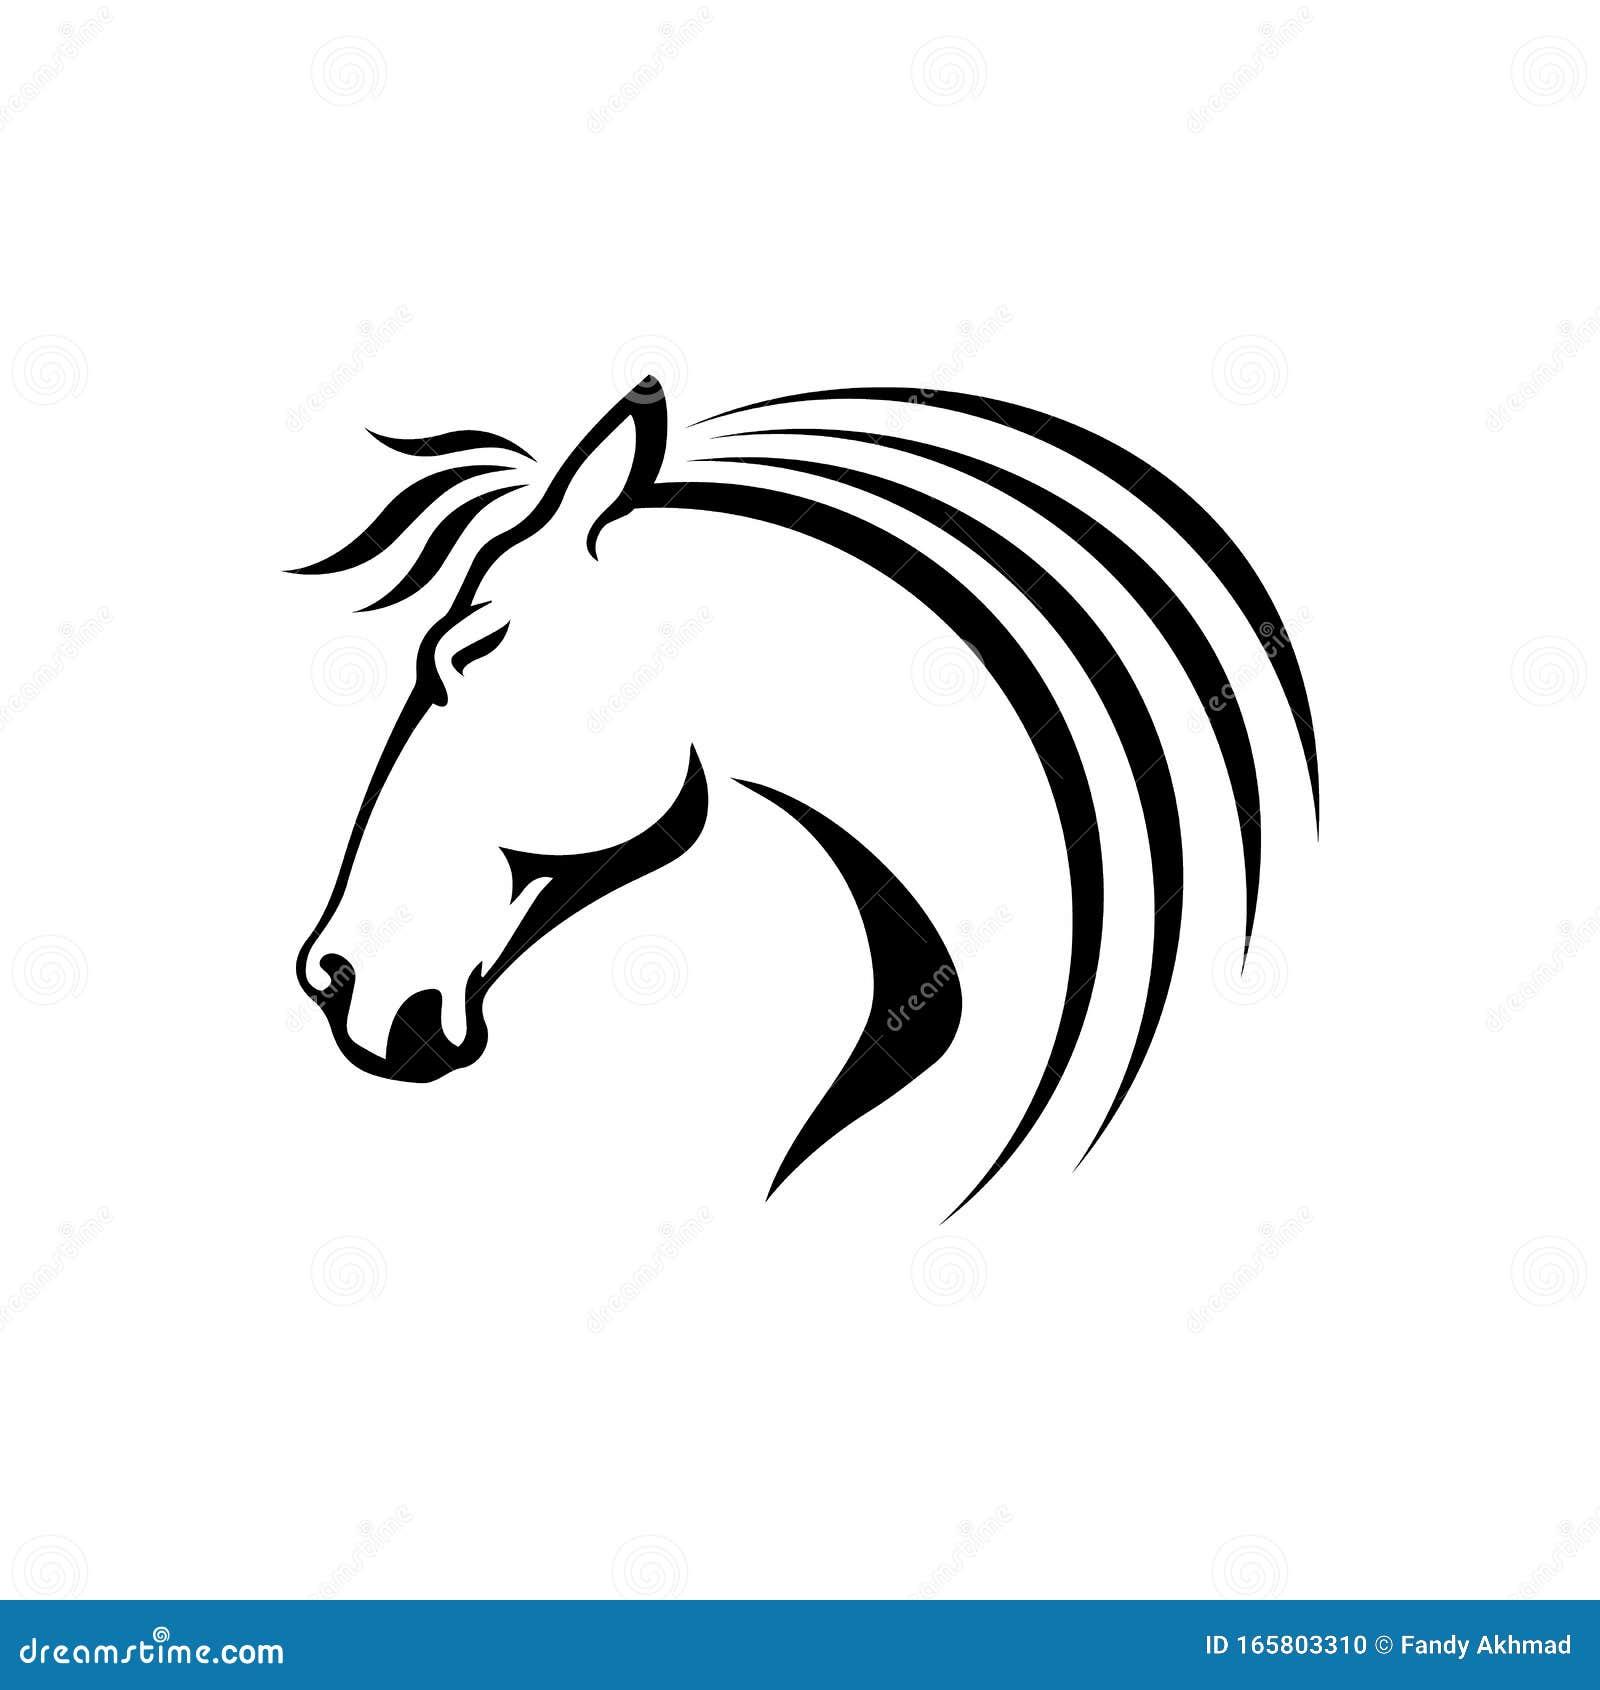 Black Stallion Horse Head Logo Vector Symbol The Silhoutte Of Black Horse Illustration Design Stock Vector Illustration Of Horses Graphic 165803310